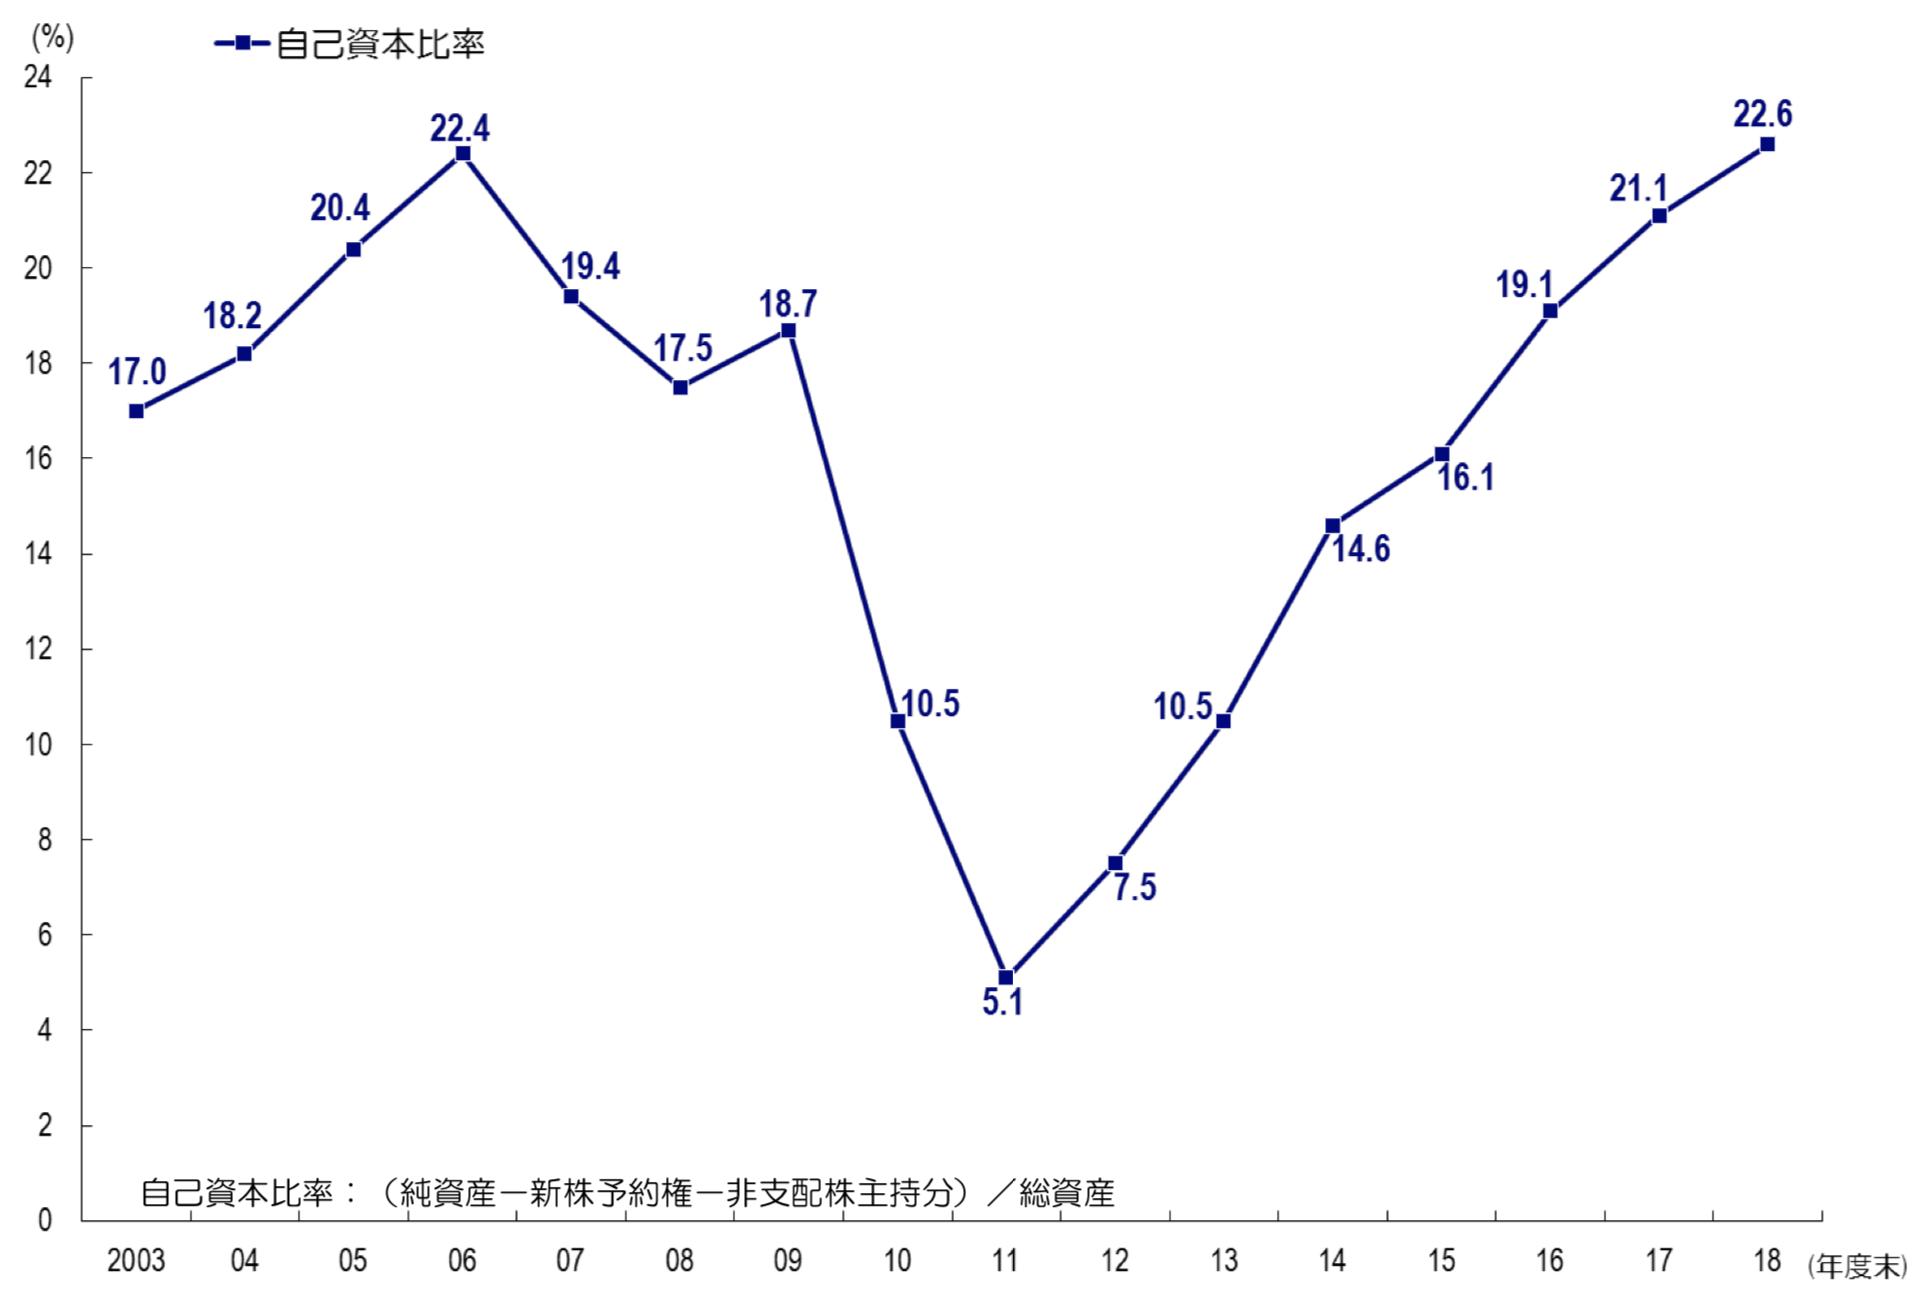 東京電力の自己資本比率